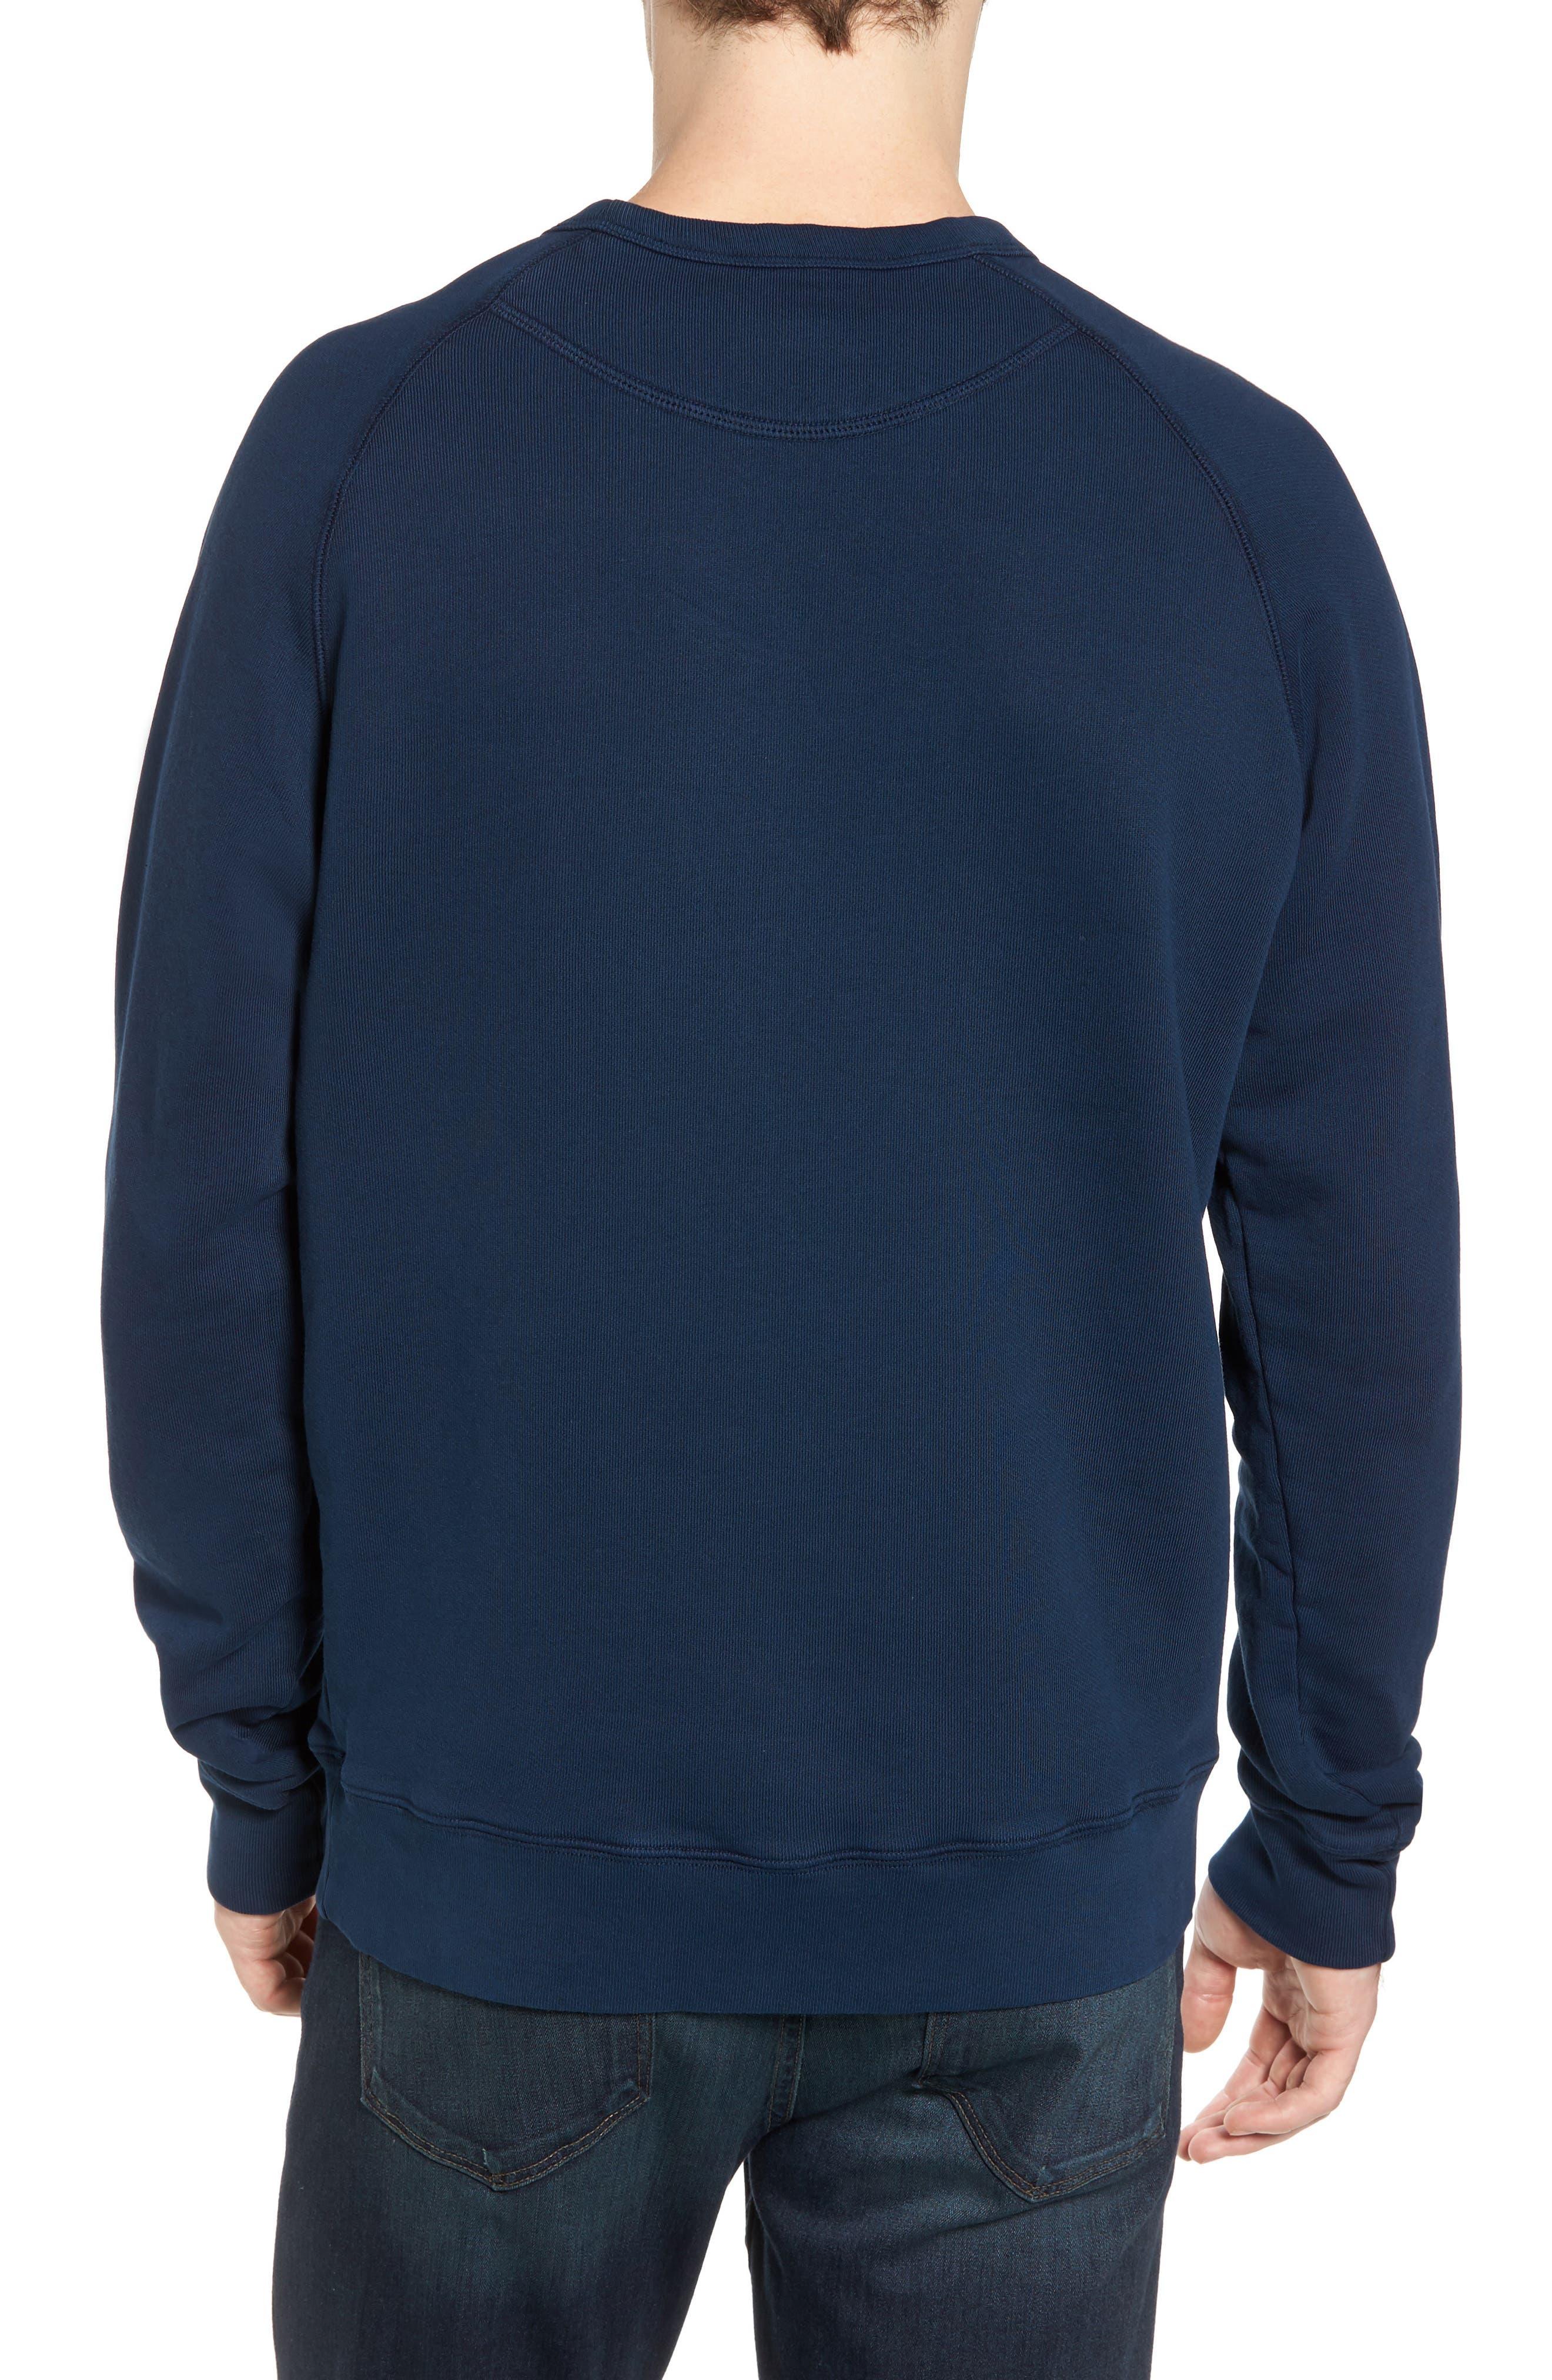 South Sea Raglan Sweatshirt,                             Alternate thumbnail 5, color,